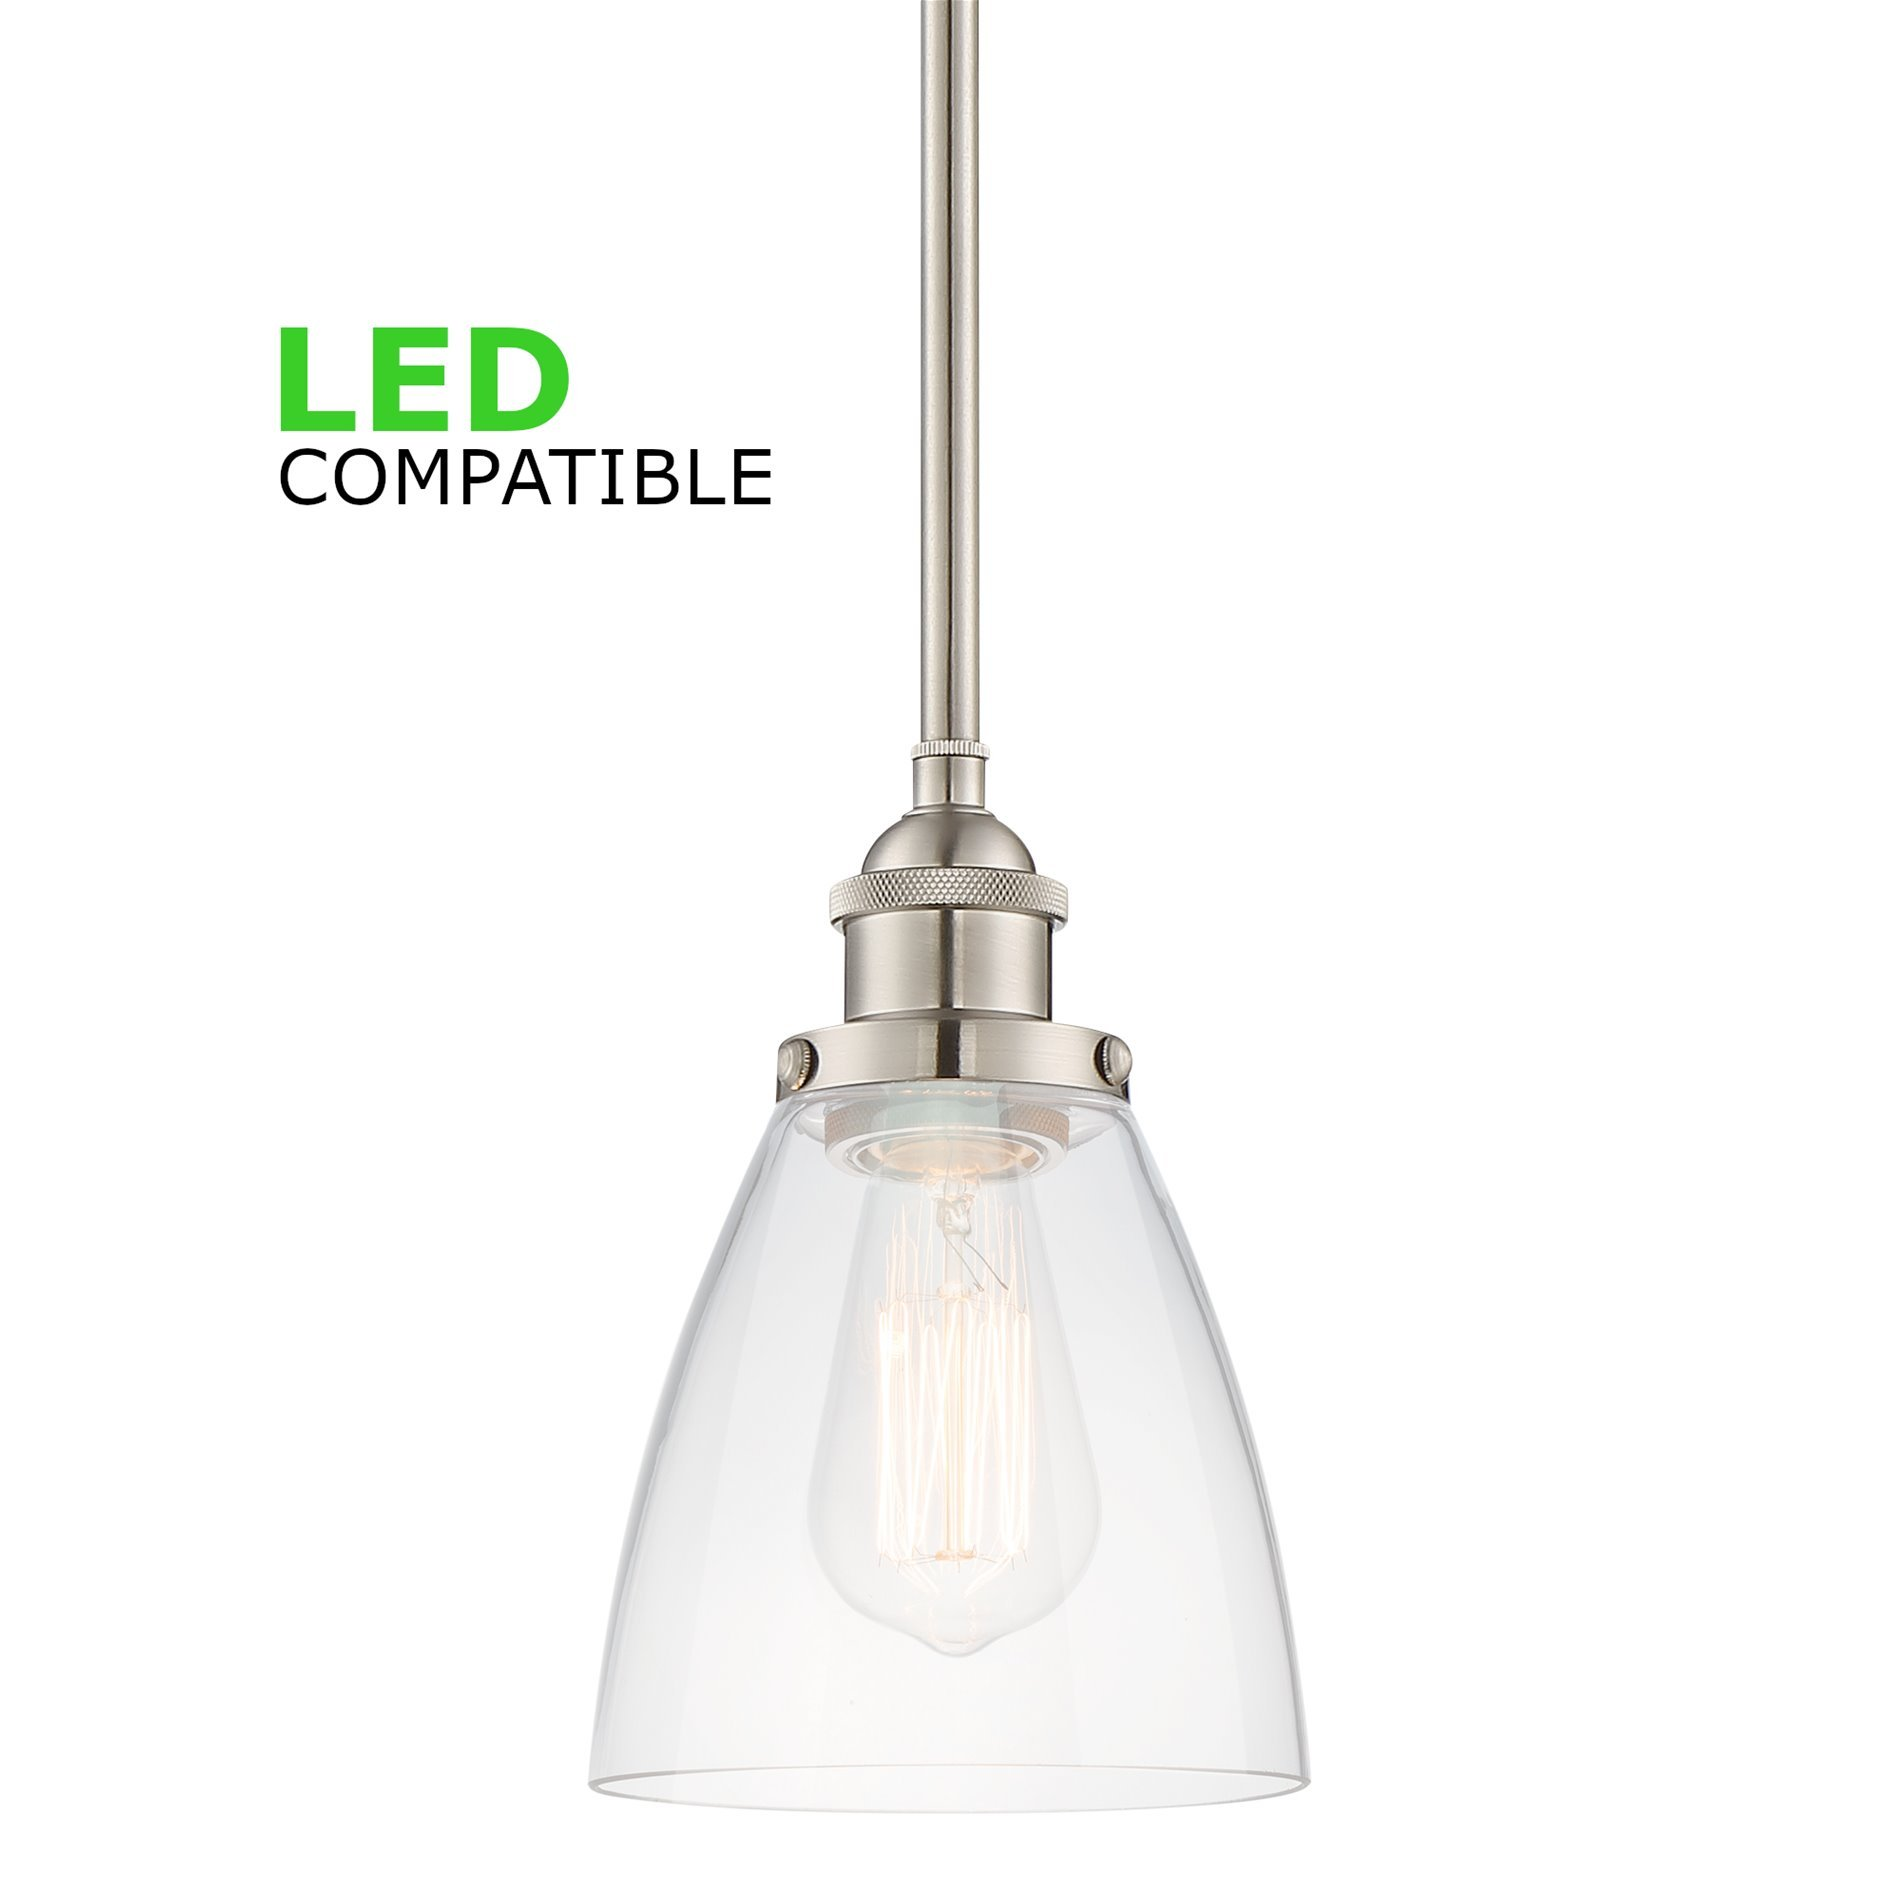 Kira Home Porter 8'' Stem-Hung Industrial Pendant Light + Mini Glass Shade, Brushed Nickel Finish